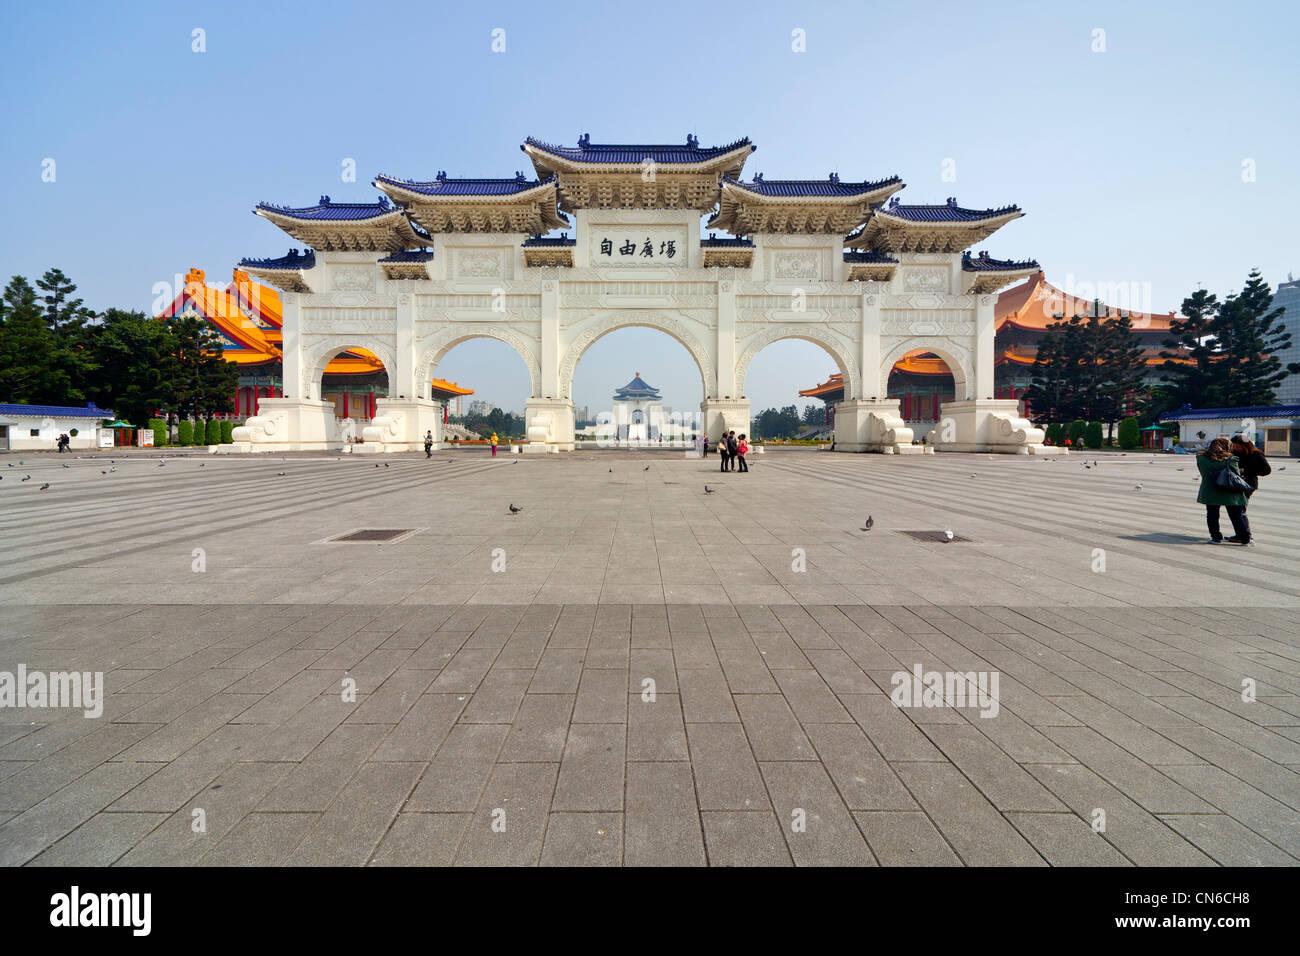 Main archway, Liberty Square (aka Freedom Square), Taipei, Taiwan. JMH5674 - Stock Image